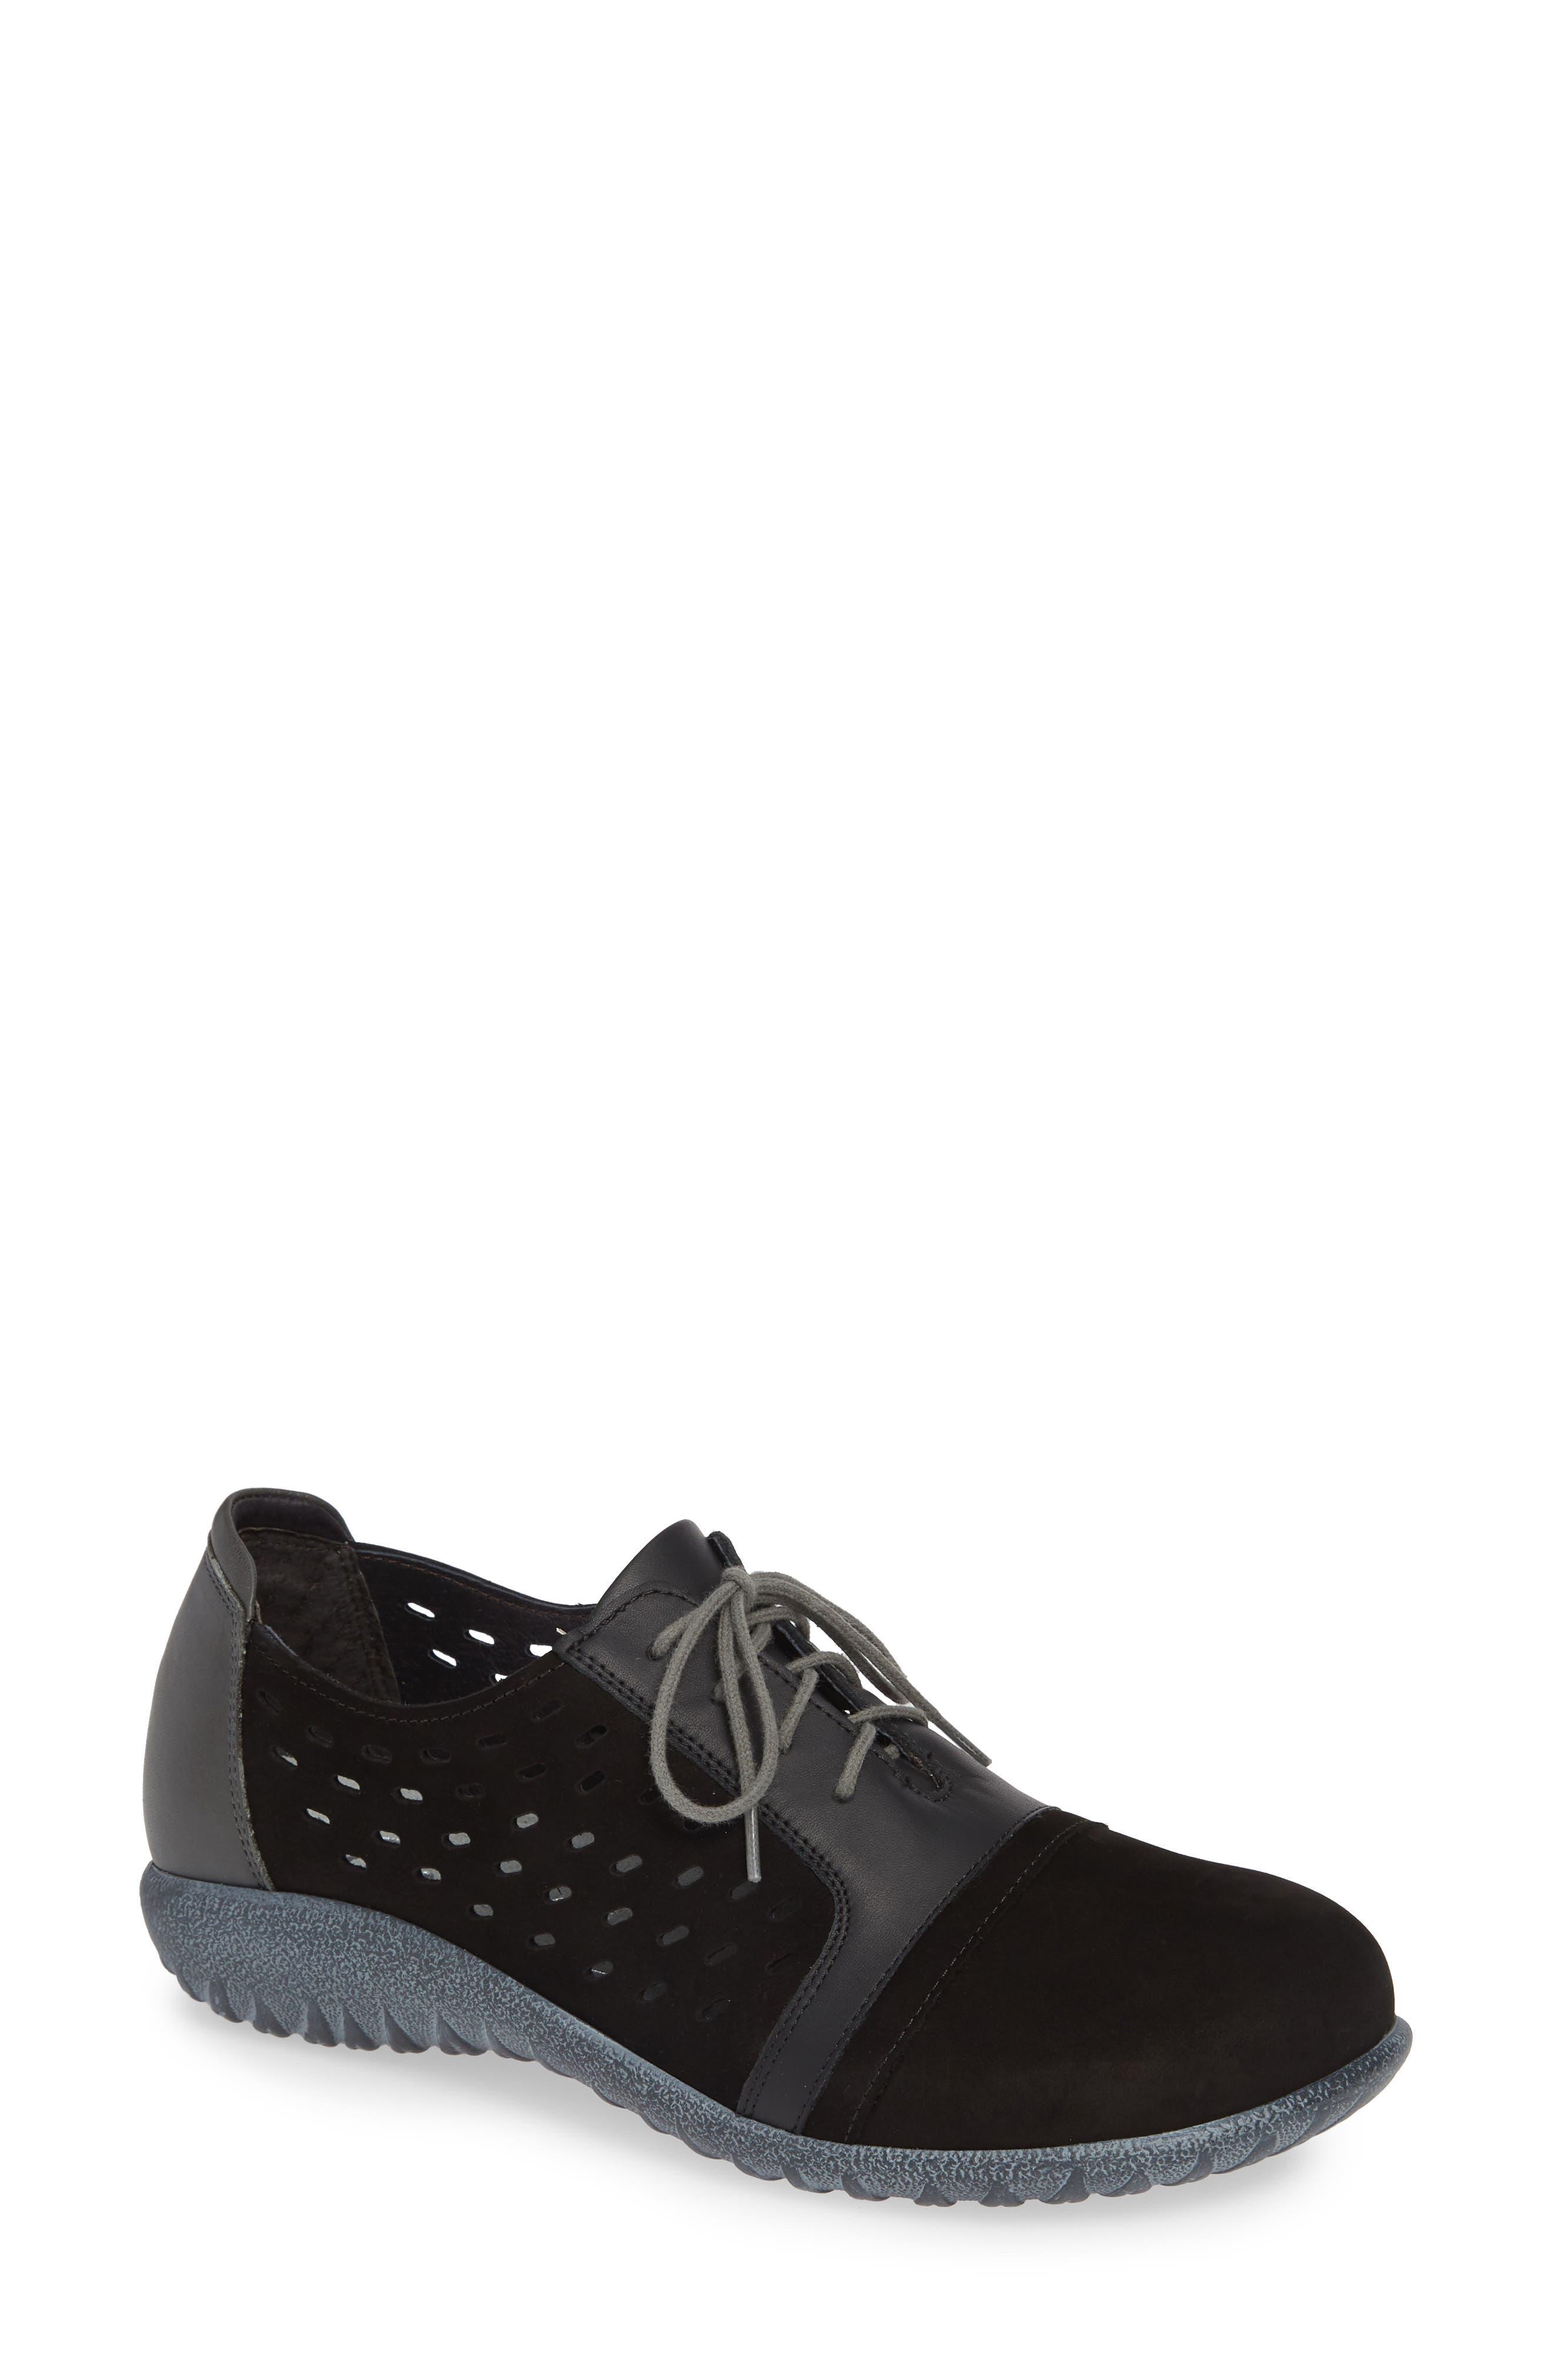 NAOT, Lalo Sneaker, Main thumbnail 1, color, BLACK NUBUCK